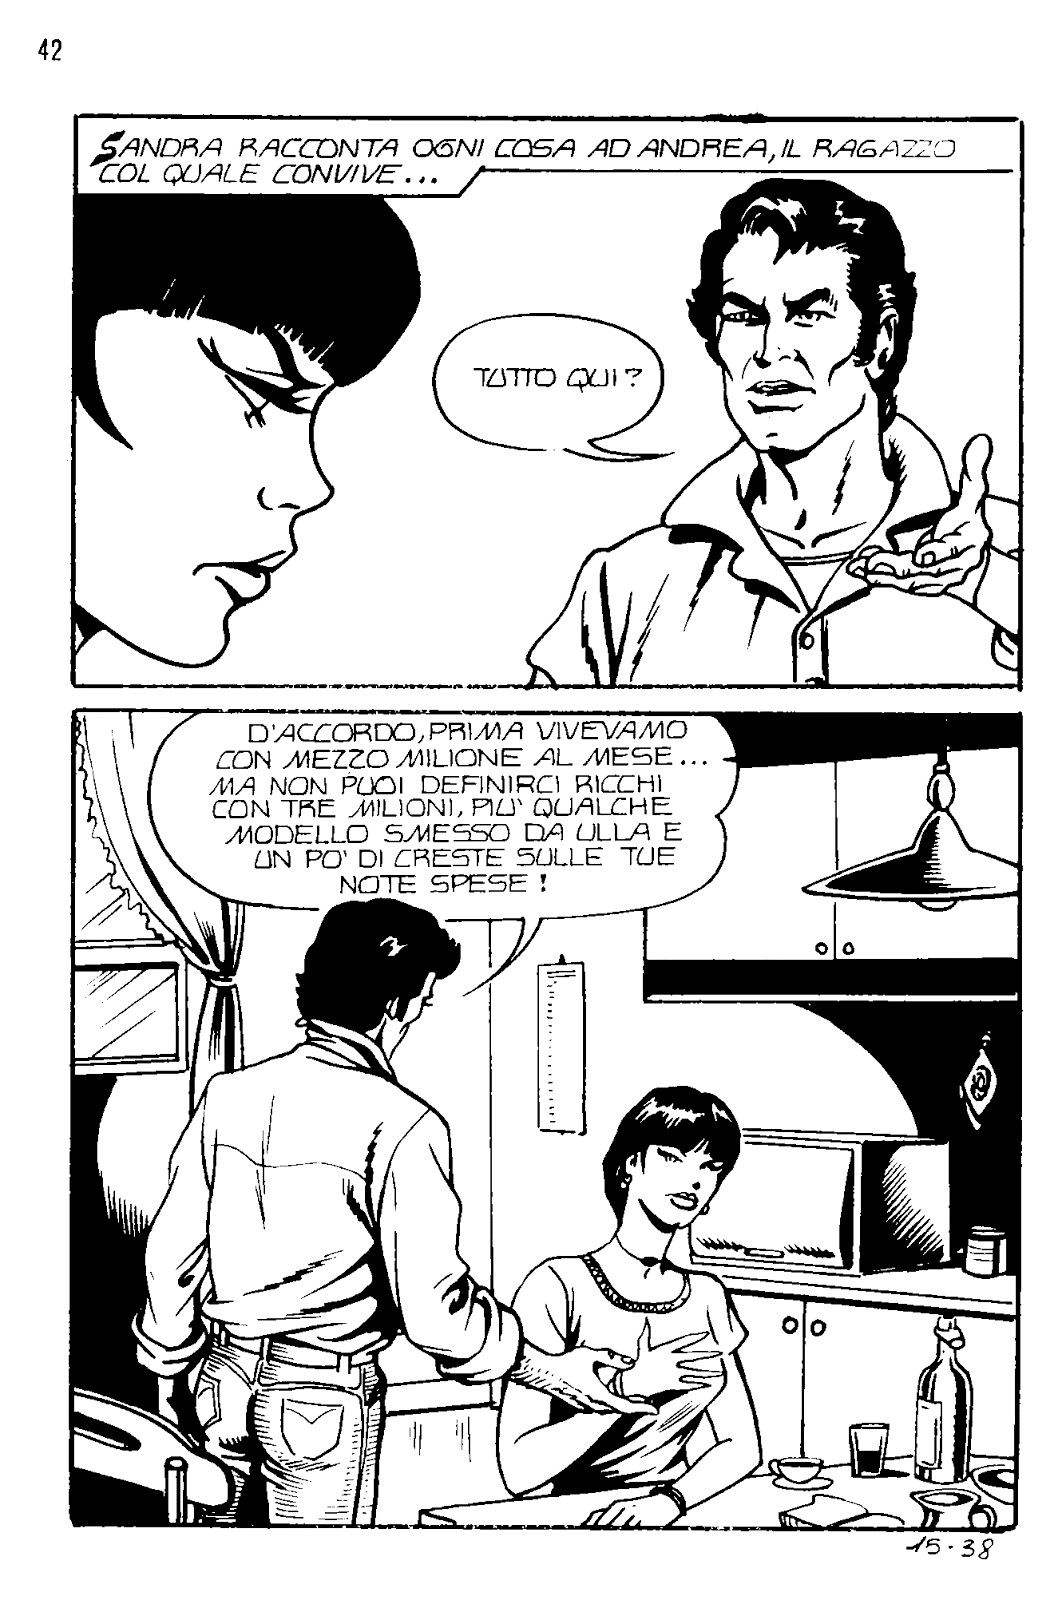 casaul teen sesso